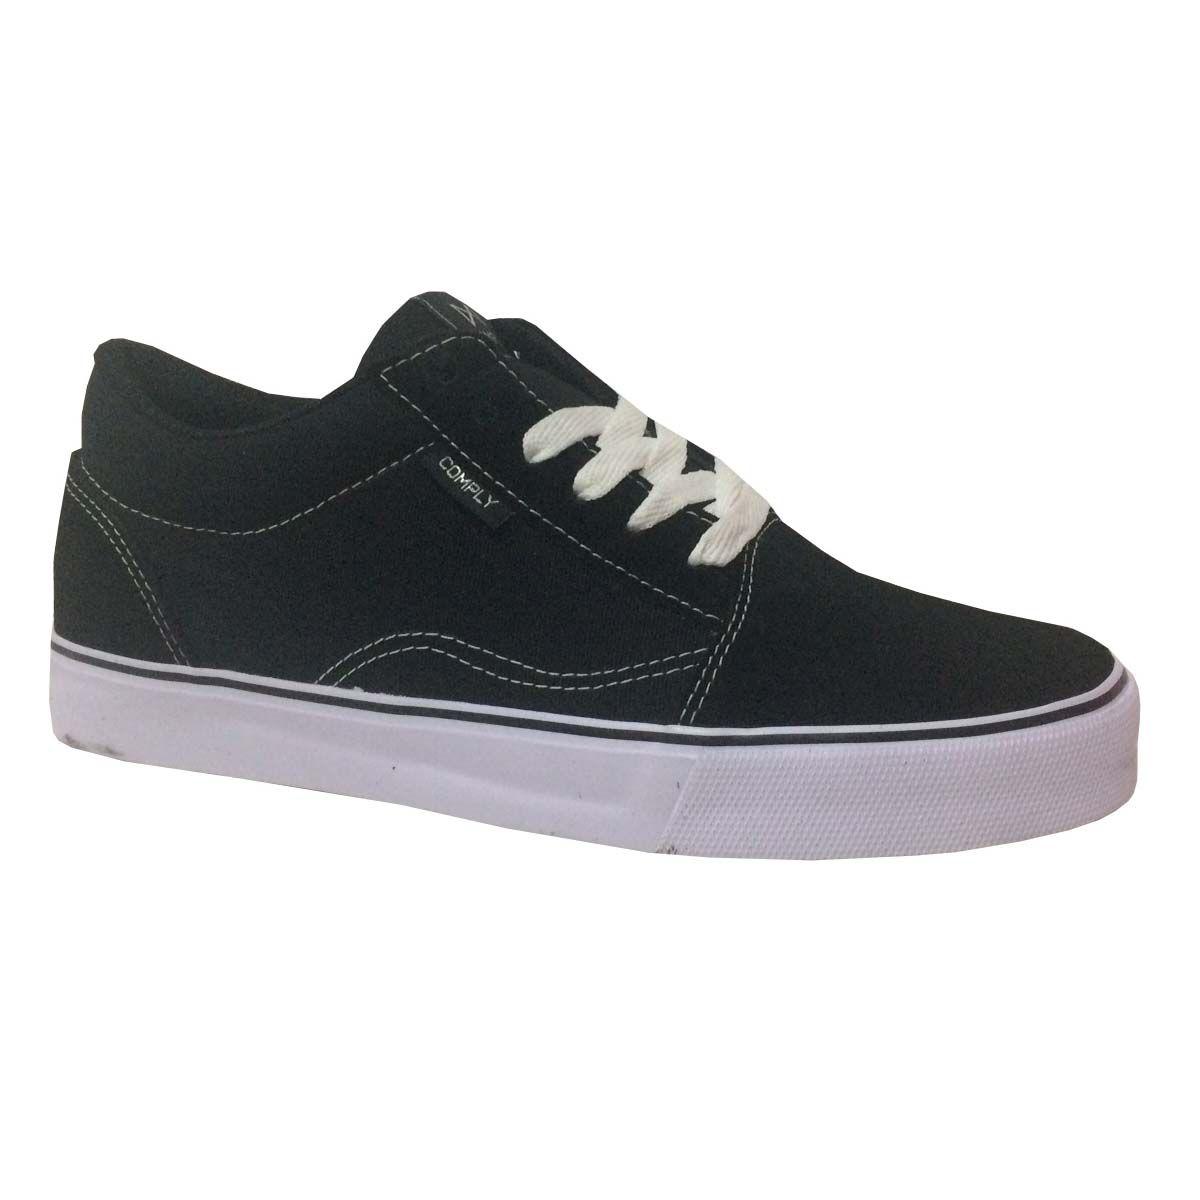 Tênis Comply skate unissex 44055